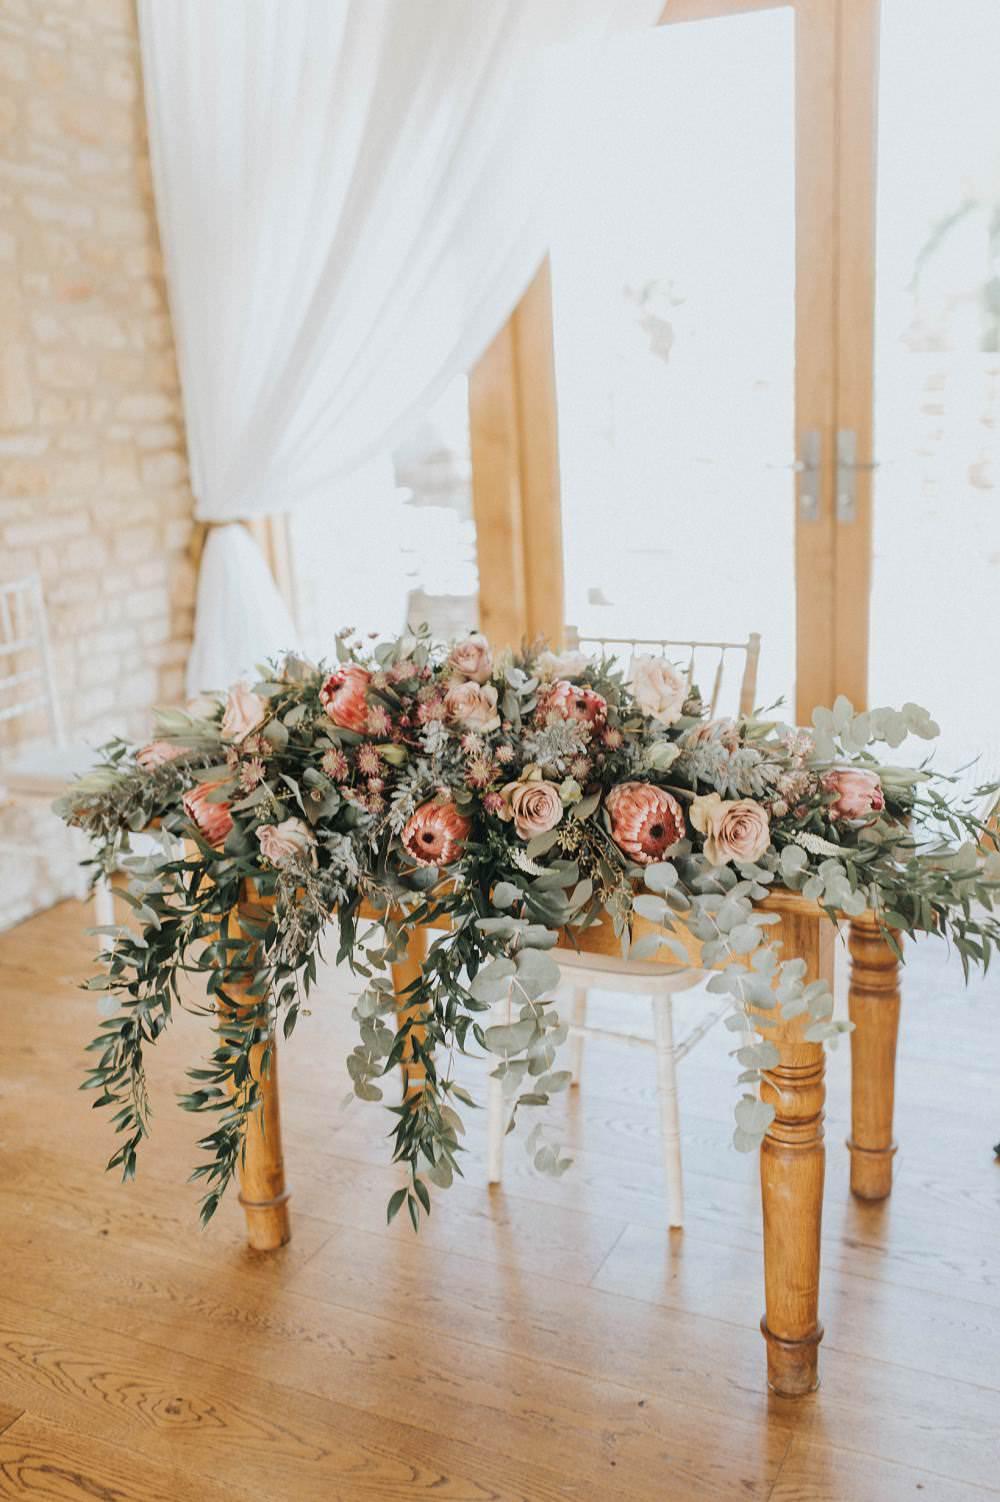 Ceremony Table Flowers Foliage Rose Protea Pink Wild Eucalyptus Boho Greenery Barn Wedding Kerry Diamond Photography